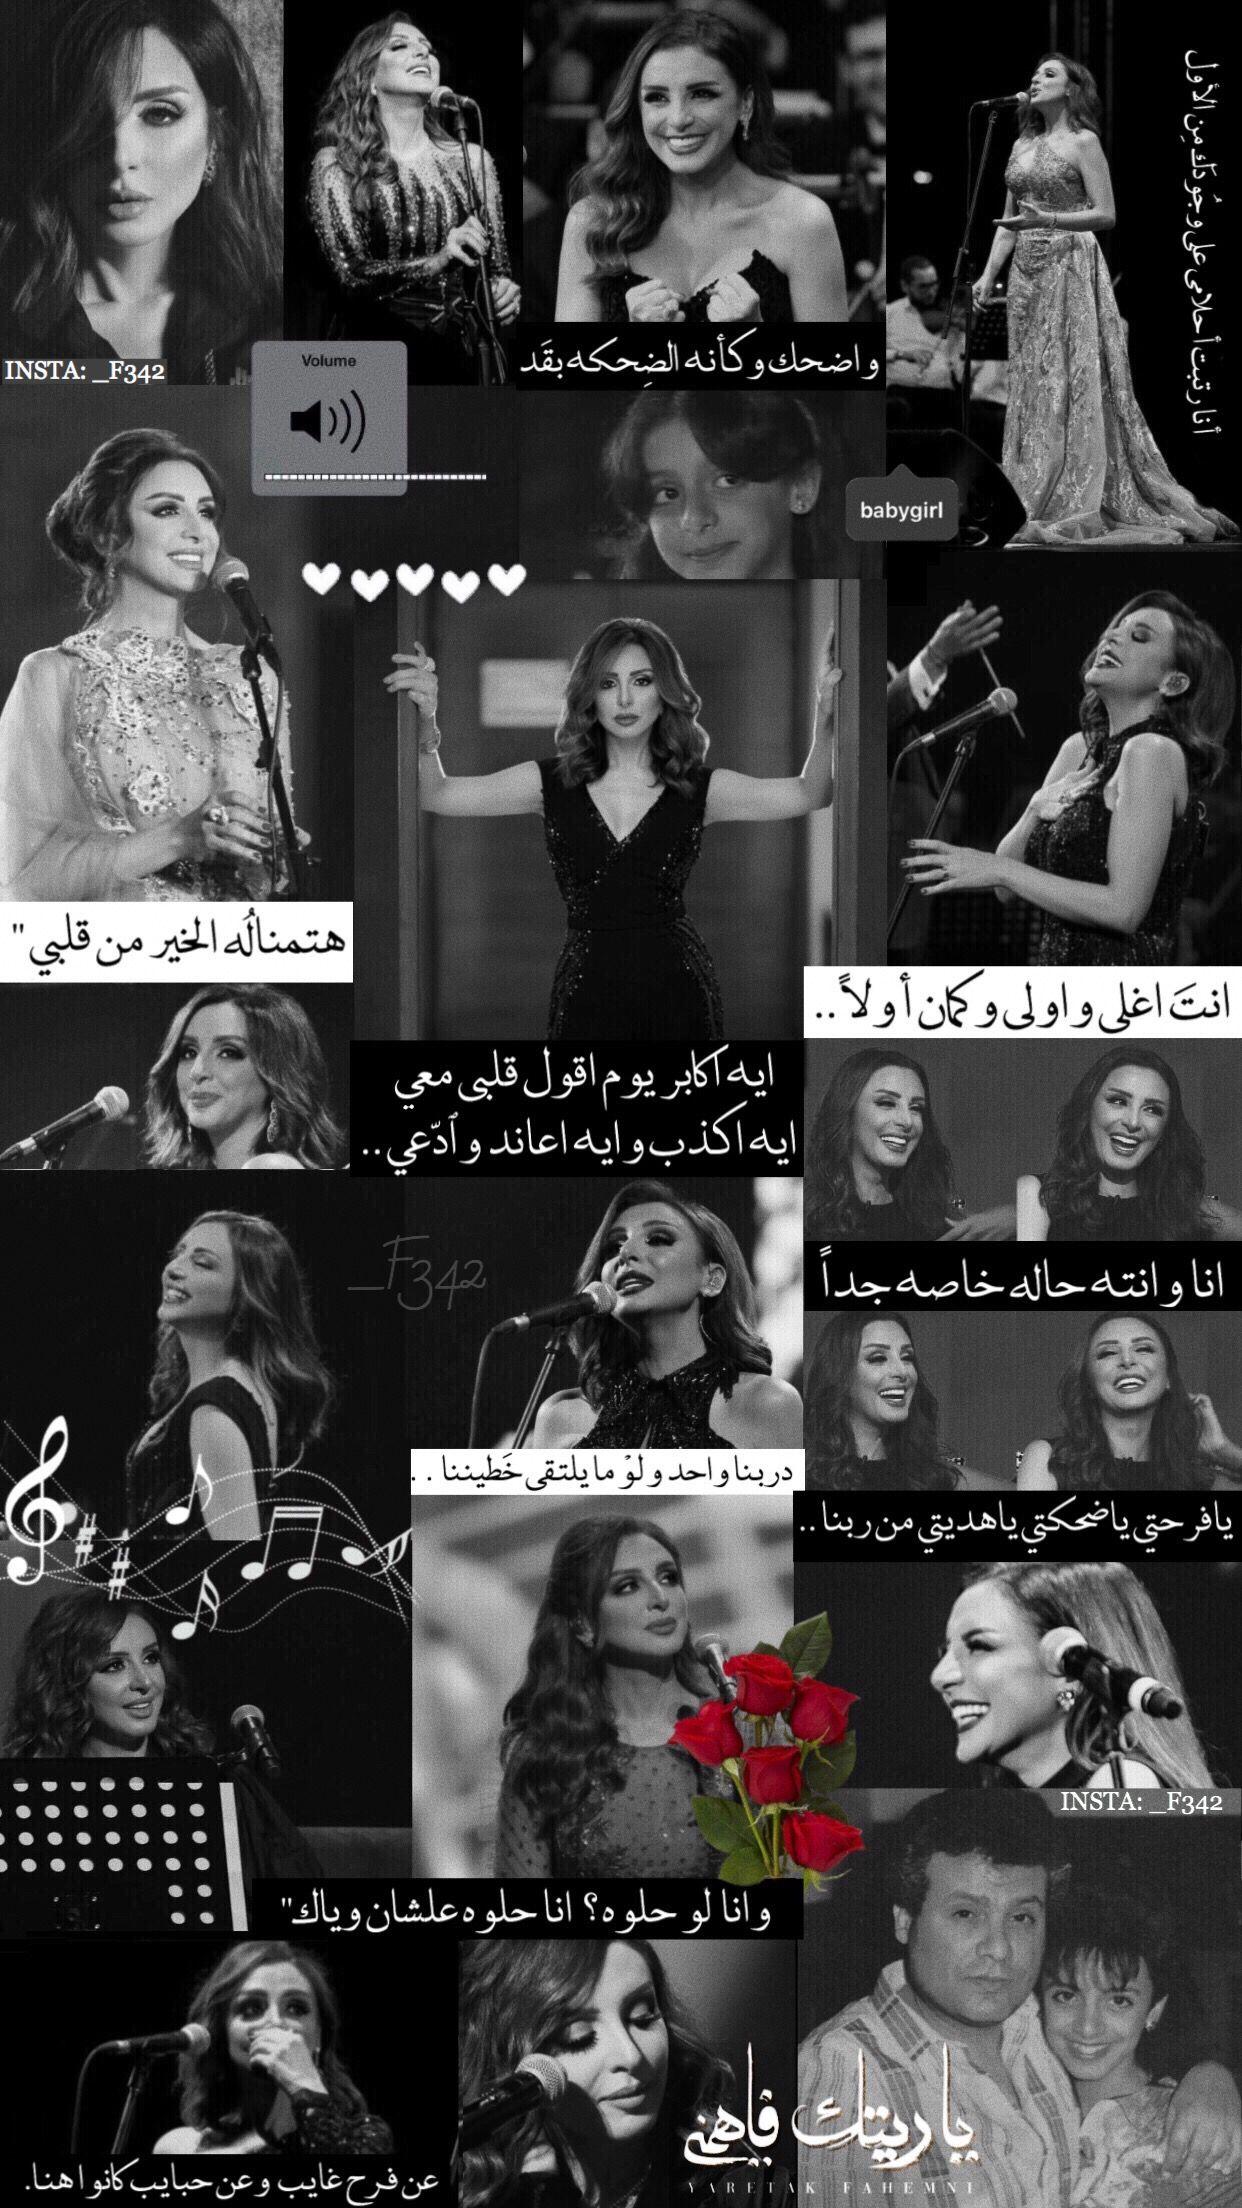 خلفيات انغام لا اسمح بستخدام تصاميمي تجاريا Cover Photo Quotes Beautiful Arabic Words Iphone Wallpaper Quotes Love